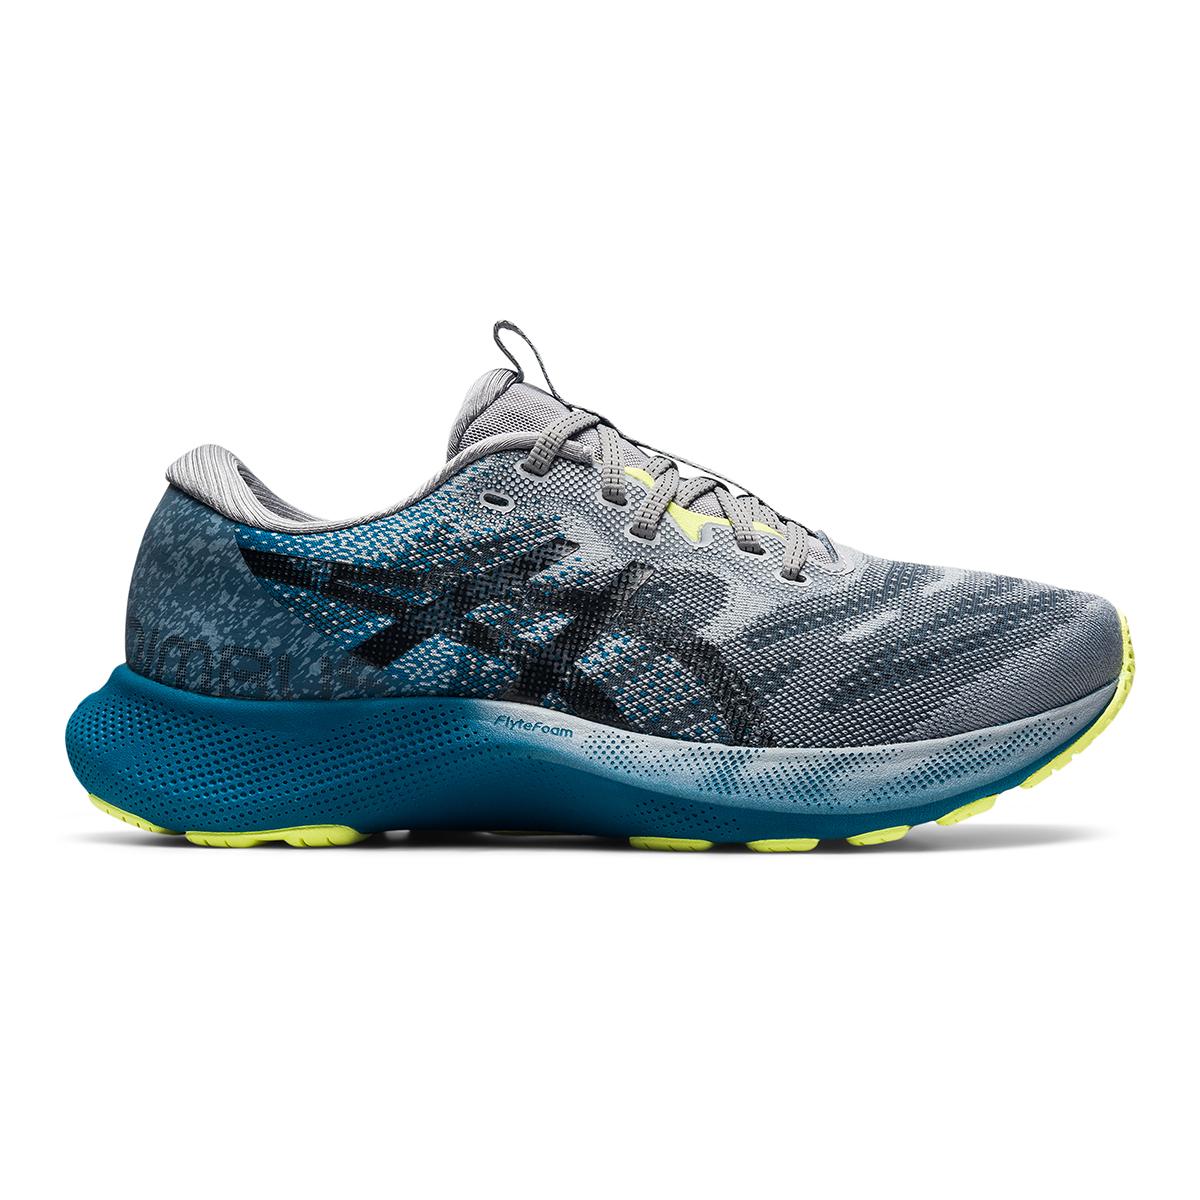 Men's Asics Gel-Nimbus Lite 2 Running Shoe - Color: Deep Sea Teal - Size: 7 - Width: Regular, Deep Sea Teal, large, image 1